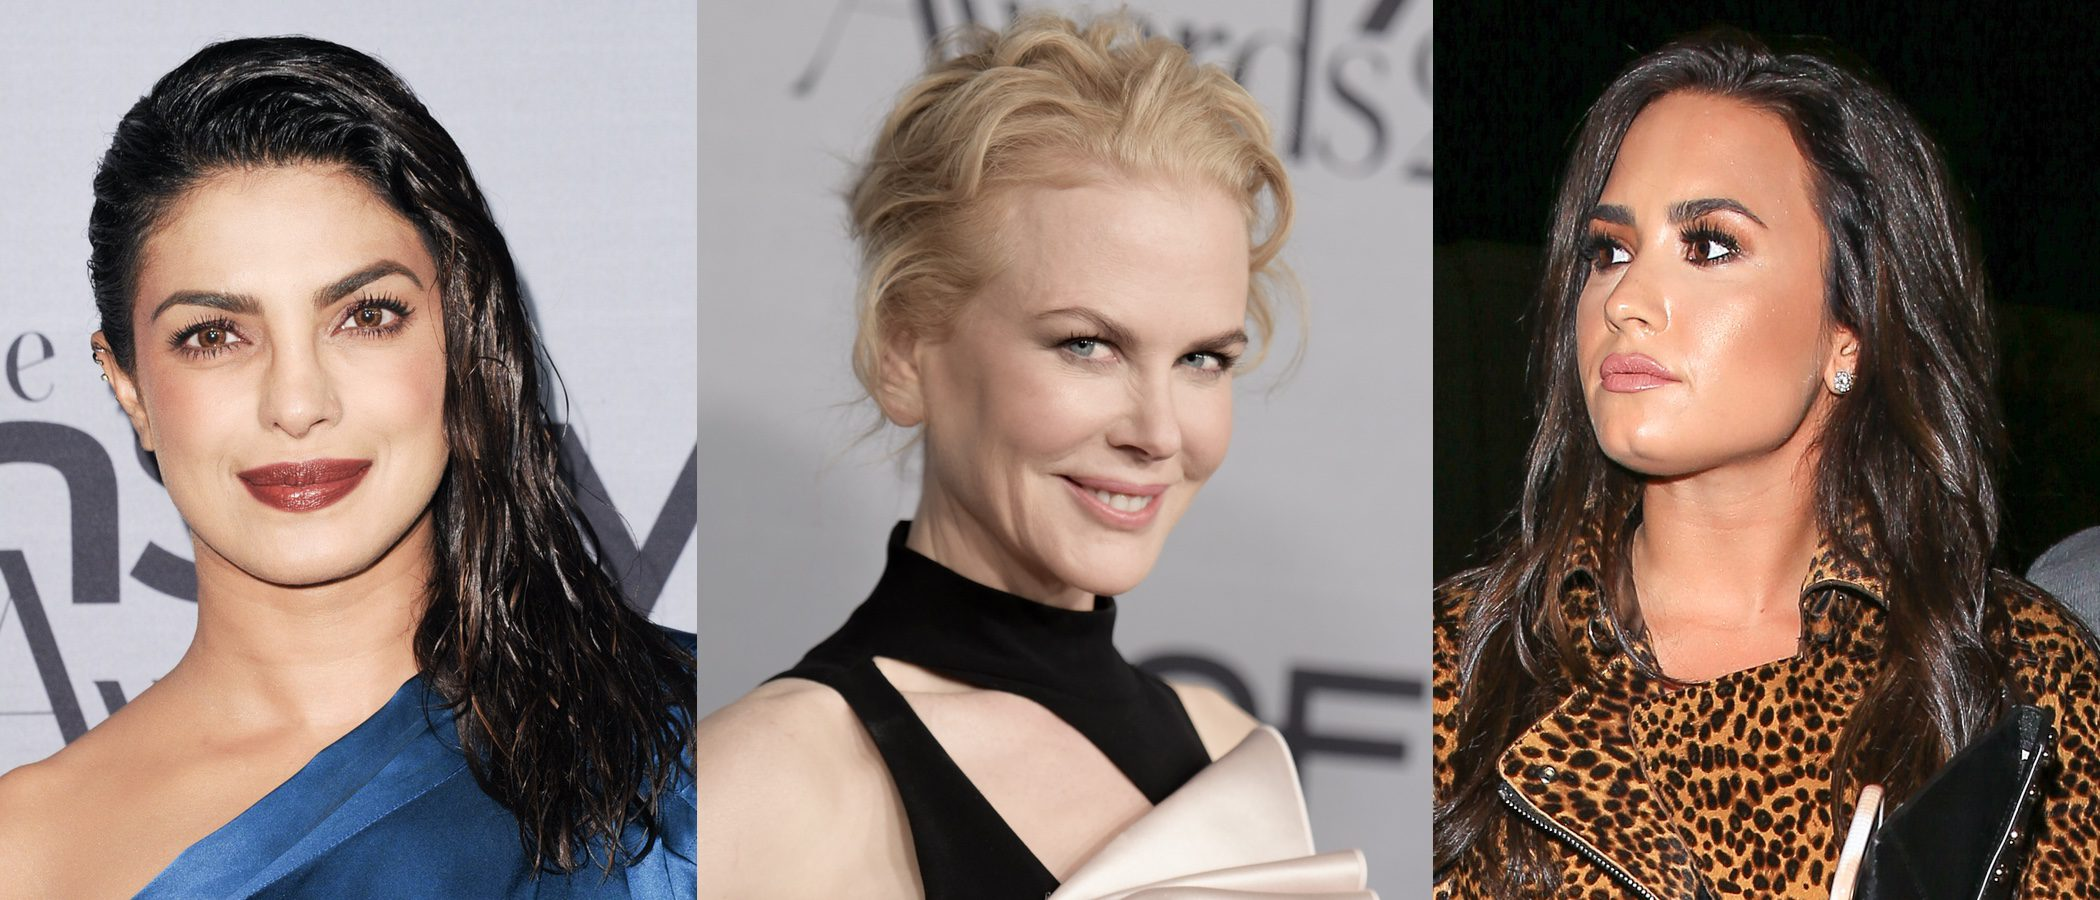 Priyanka Chopra, Nicole Kidman y Demi Lovato entre los peores beauty looks de la semana